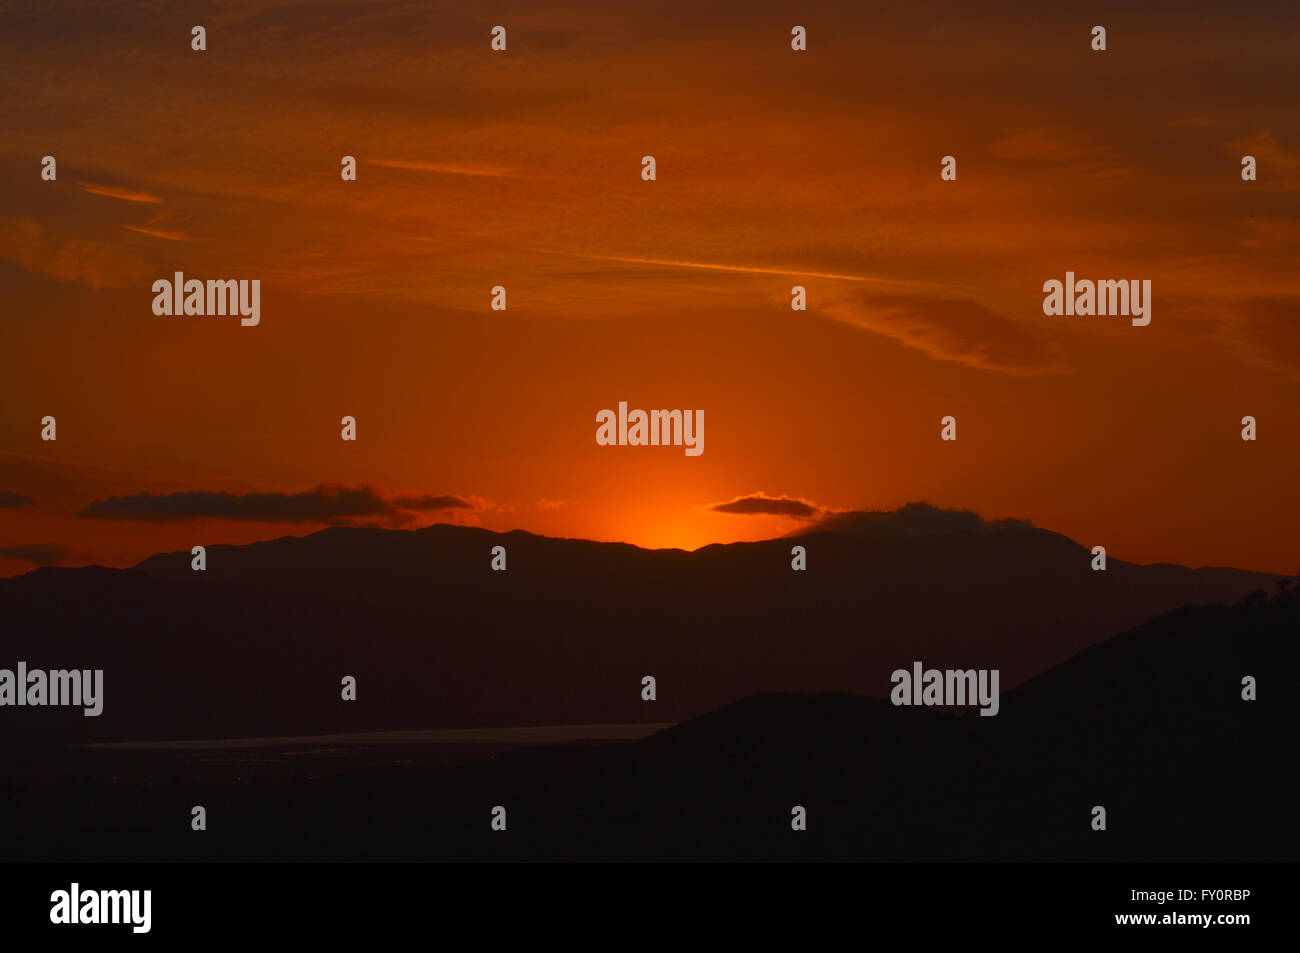 Orange Sunset, Lake Elsinore, California - Stock Image